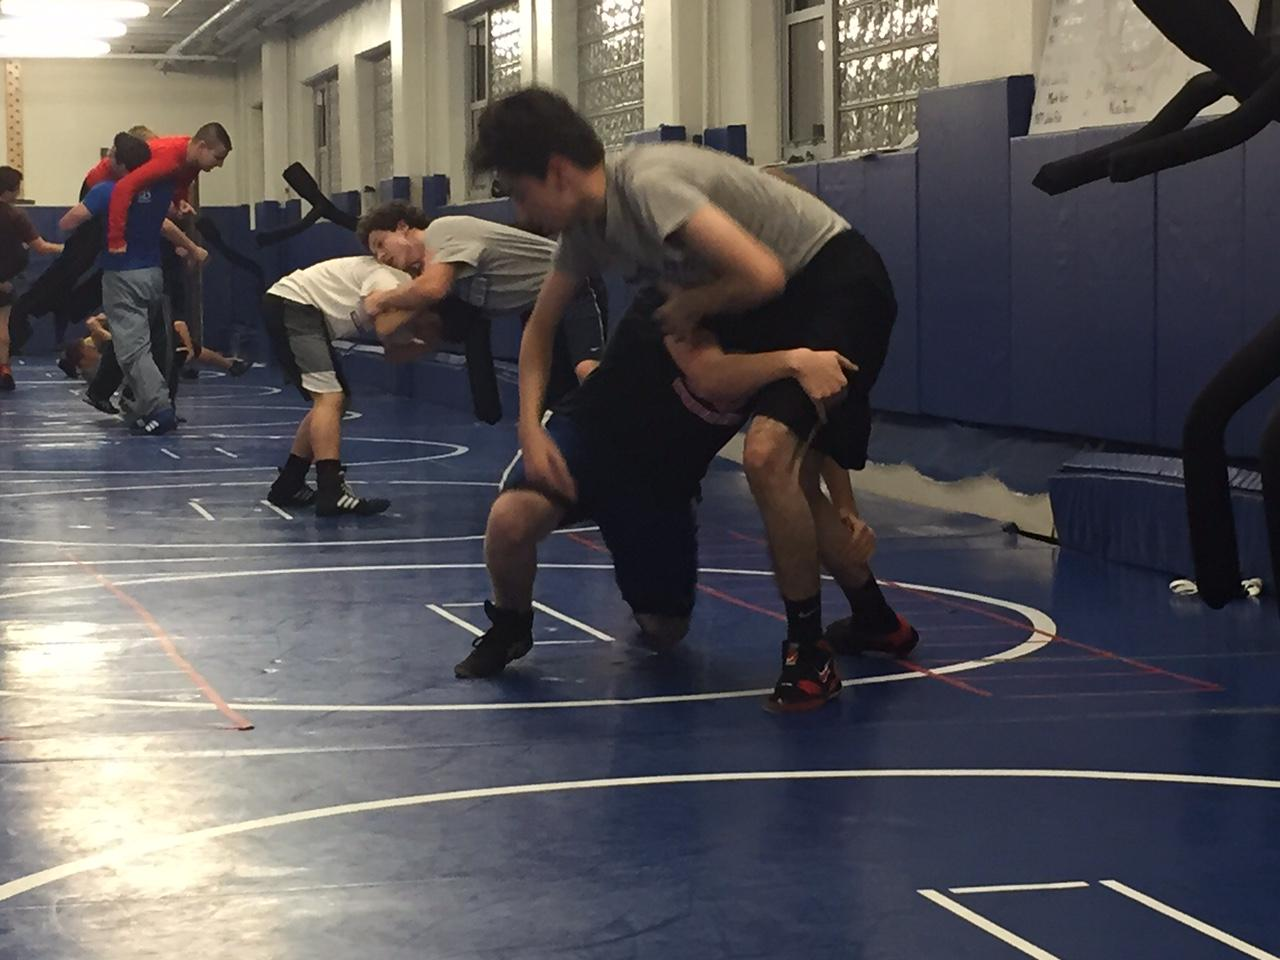 RB boys wrestling practice.